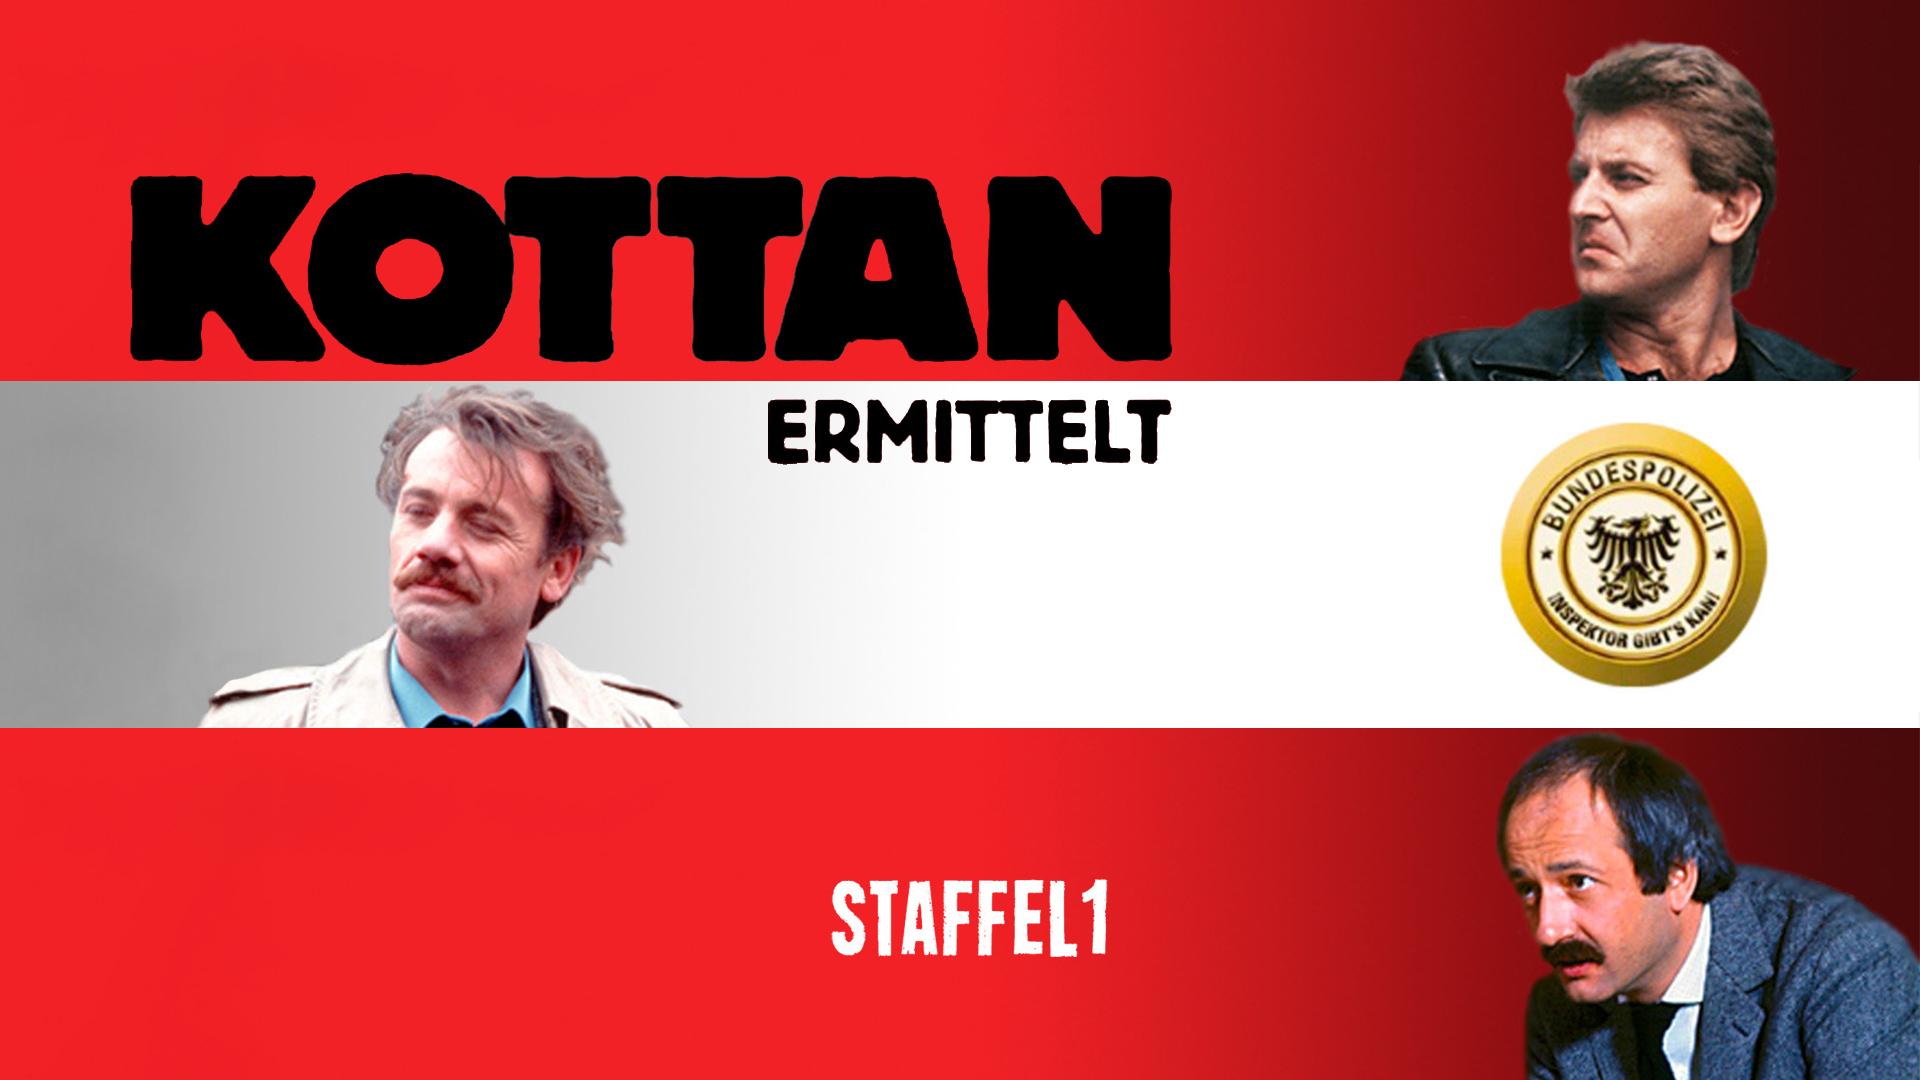 Kottan ermittelt, die komplette Serie